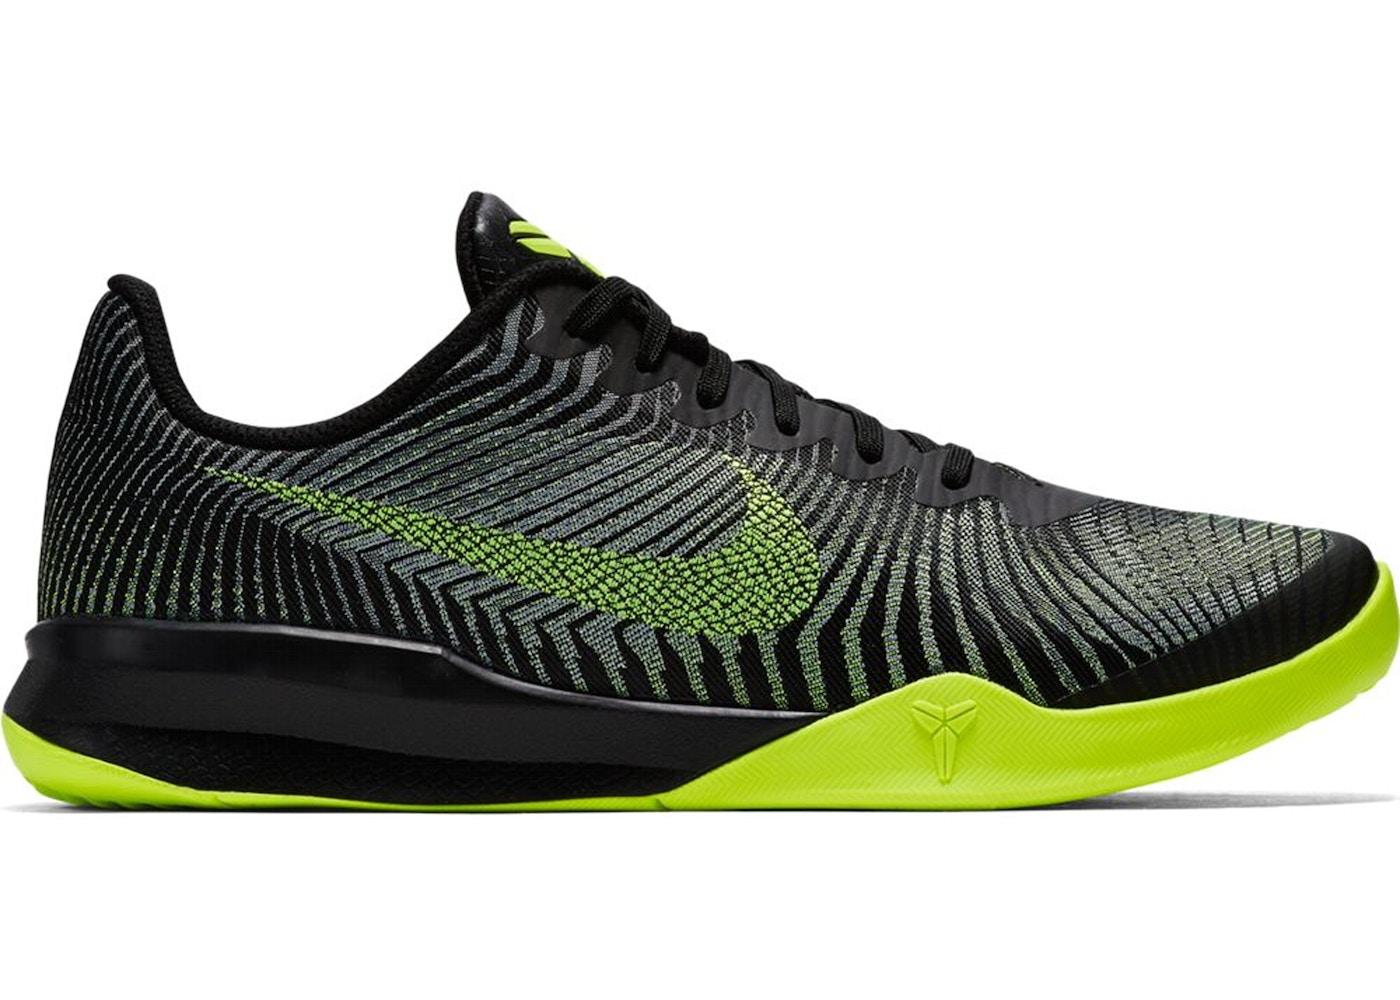 Nike KB Mentality 2 Black Volt Wolf Grey - 818952-006